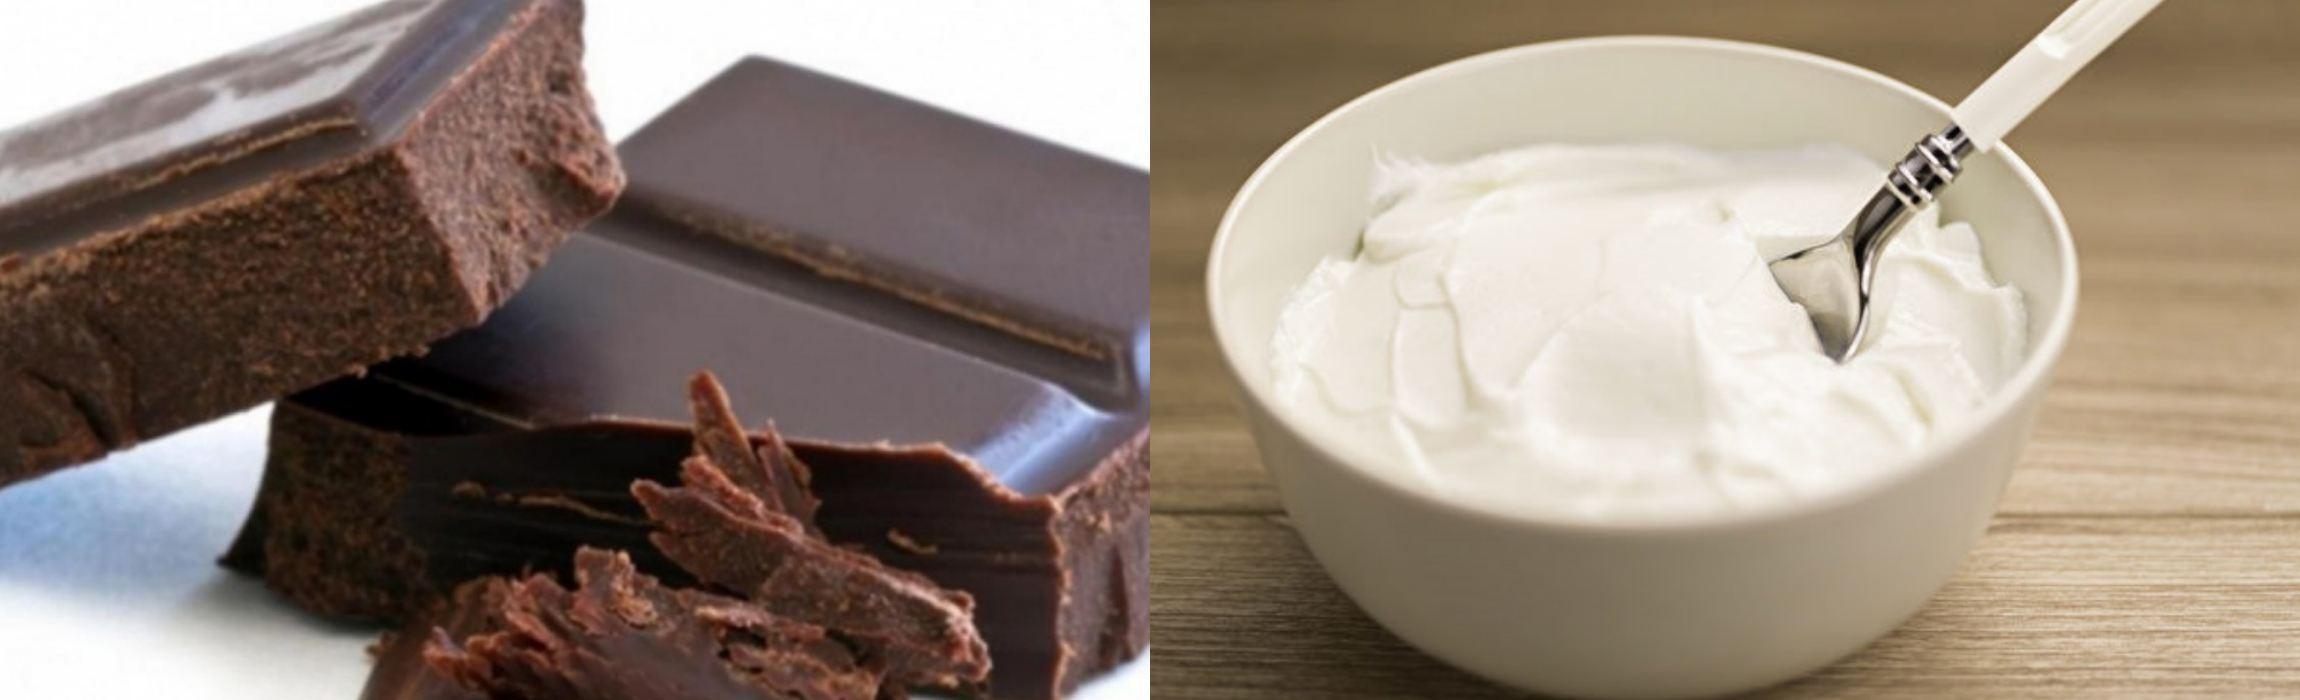 dark chocolate yogurt - 我们应该如何面对与处理焦虑?